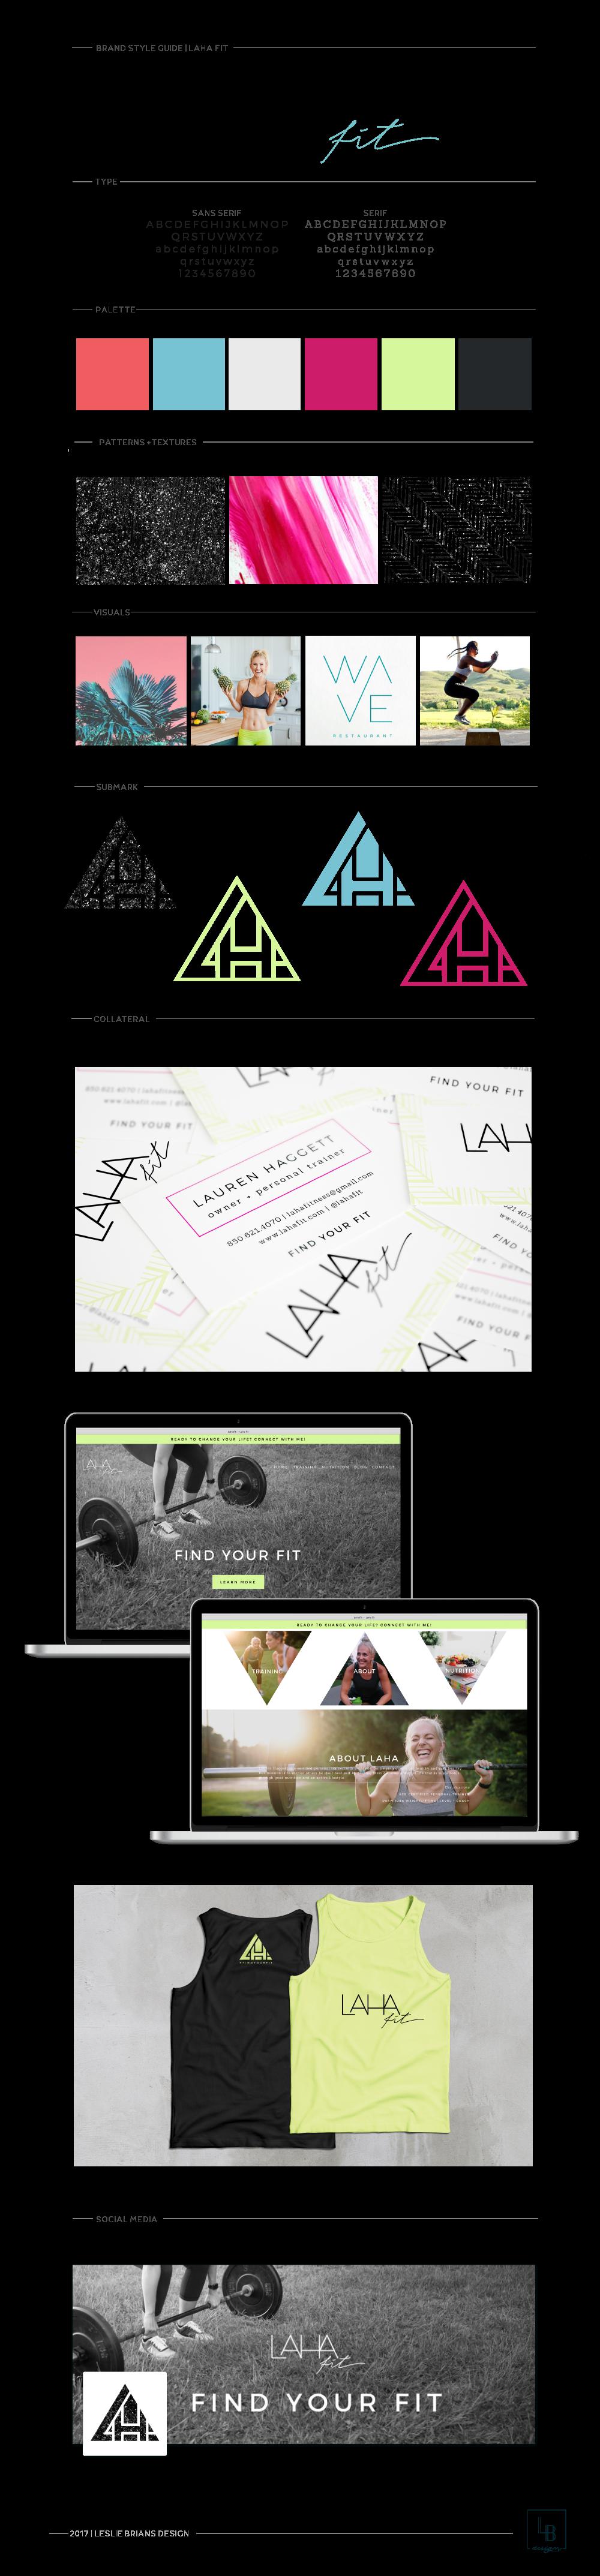 laha-fit_branding.png